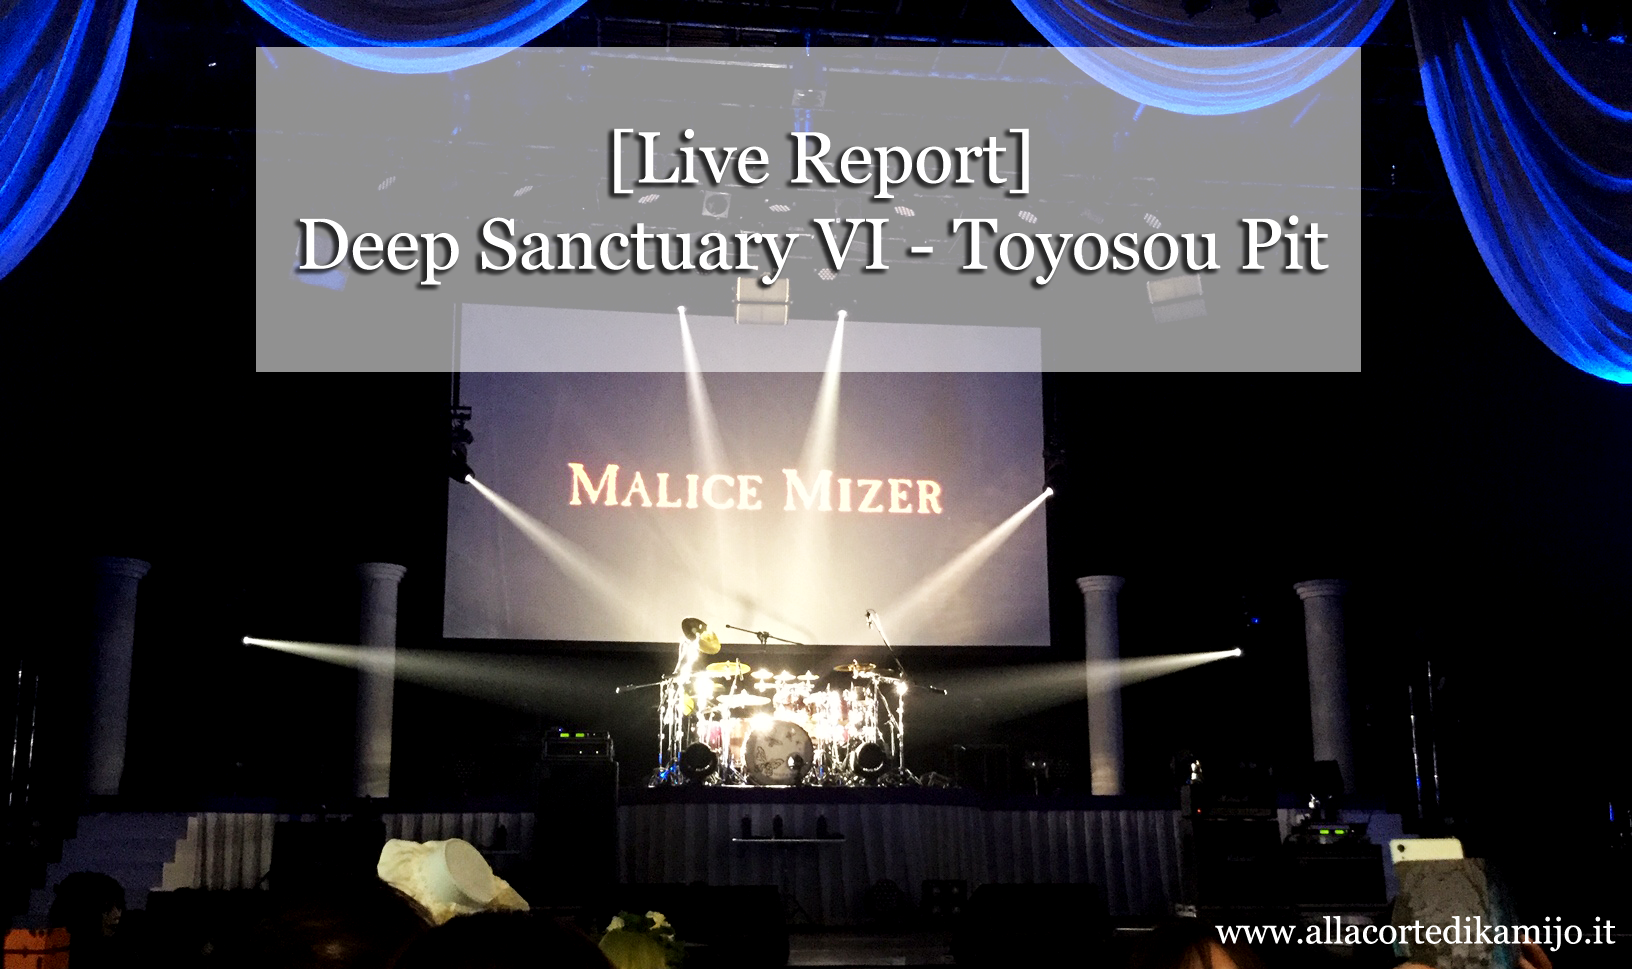 [Live Report] Deep Sanctuary VI